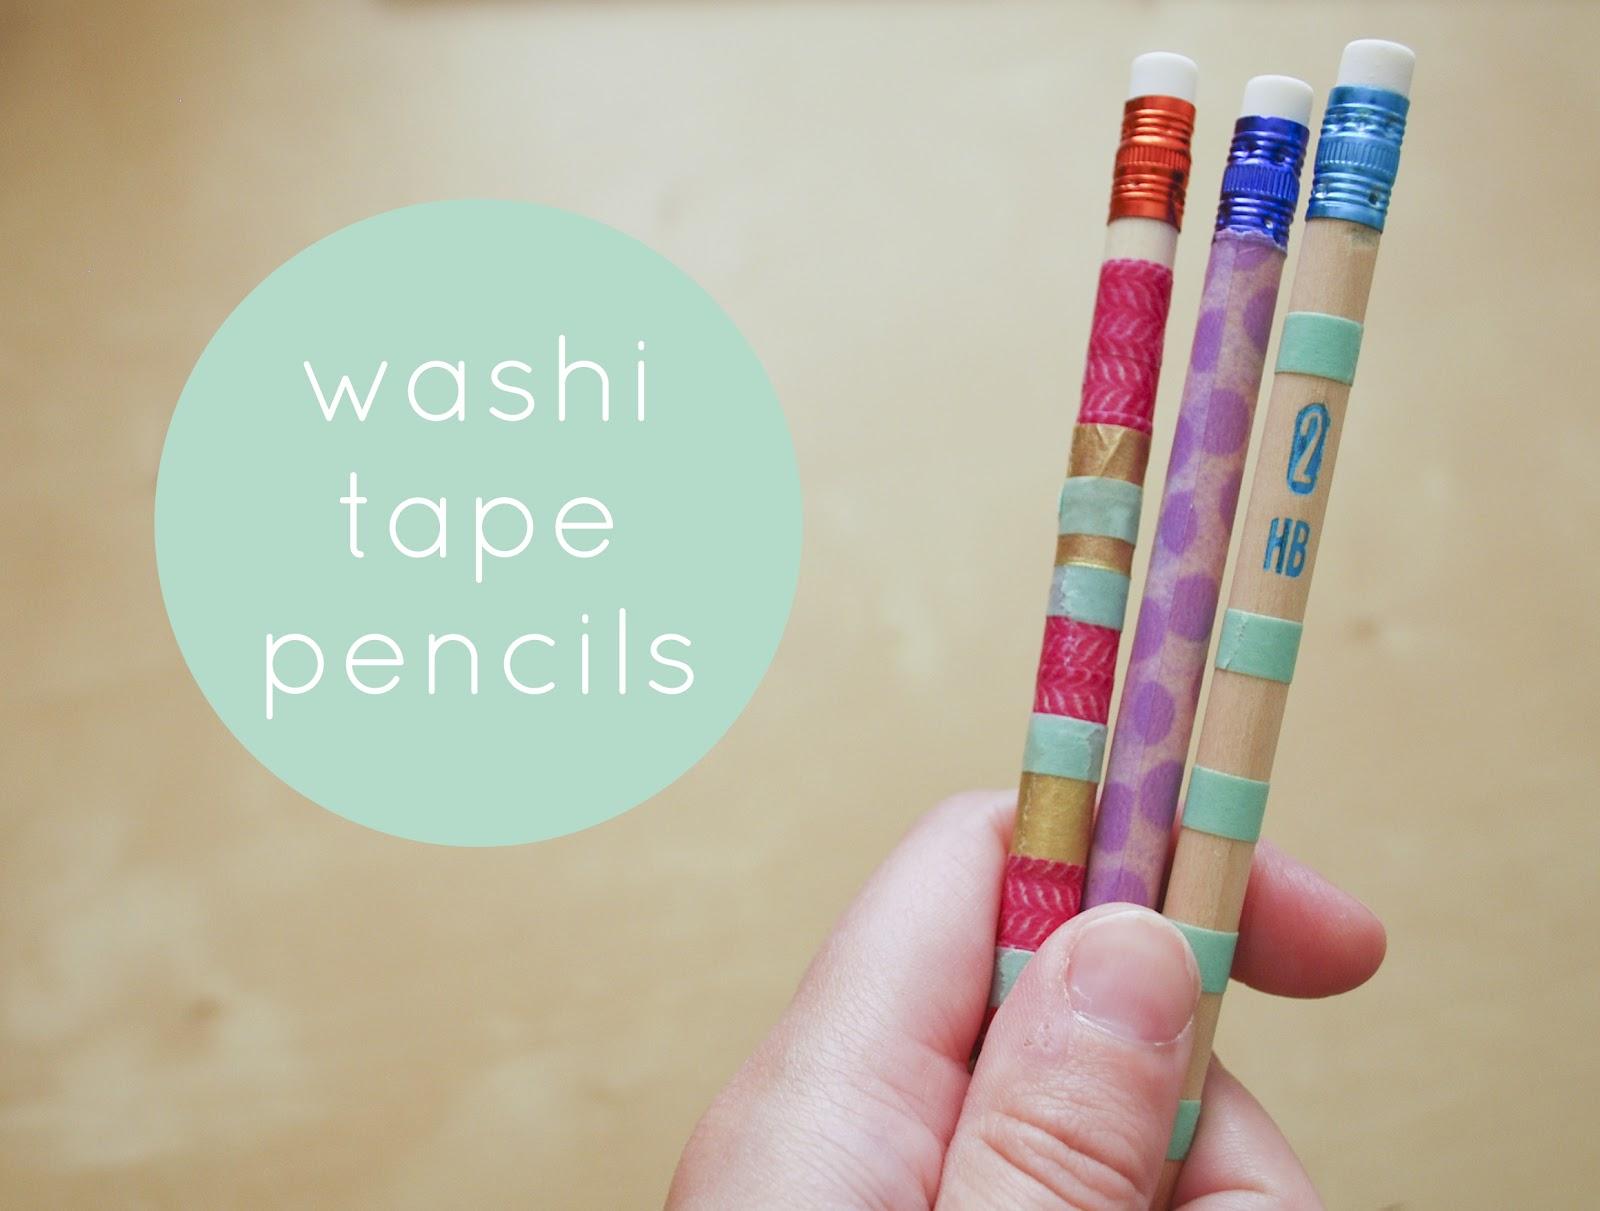 Washi tape on pinterest masking tape blanco y negro and for Washi tape project ideas